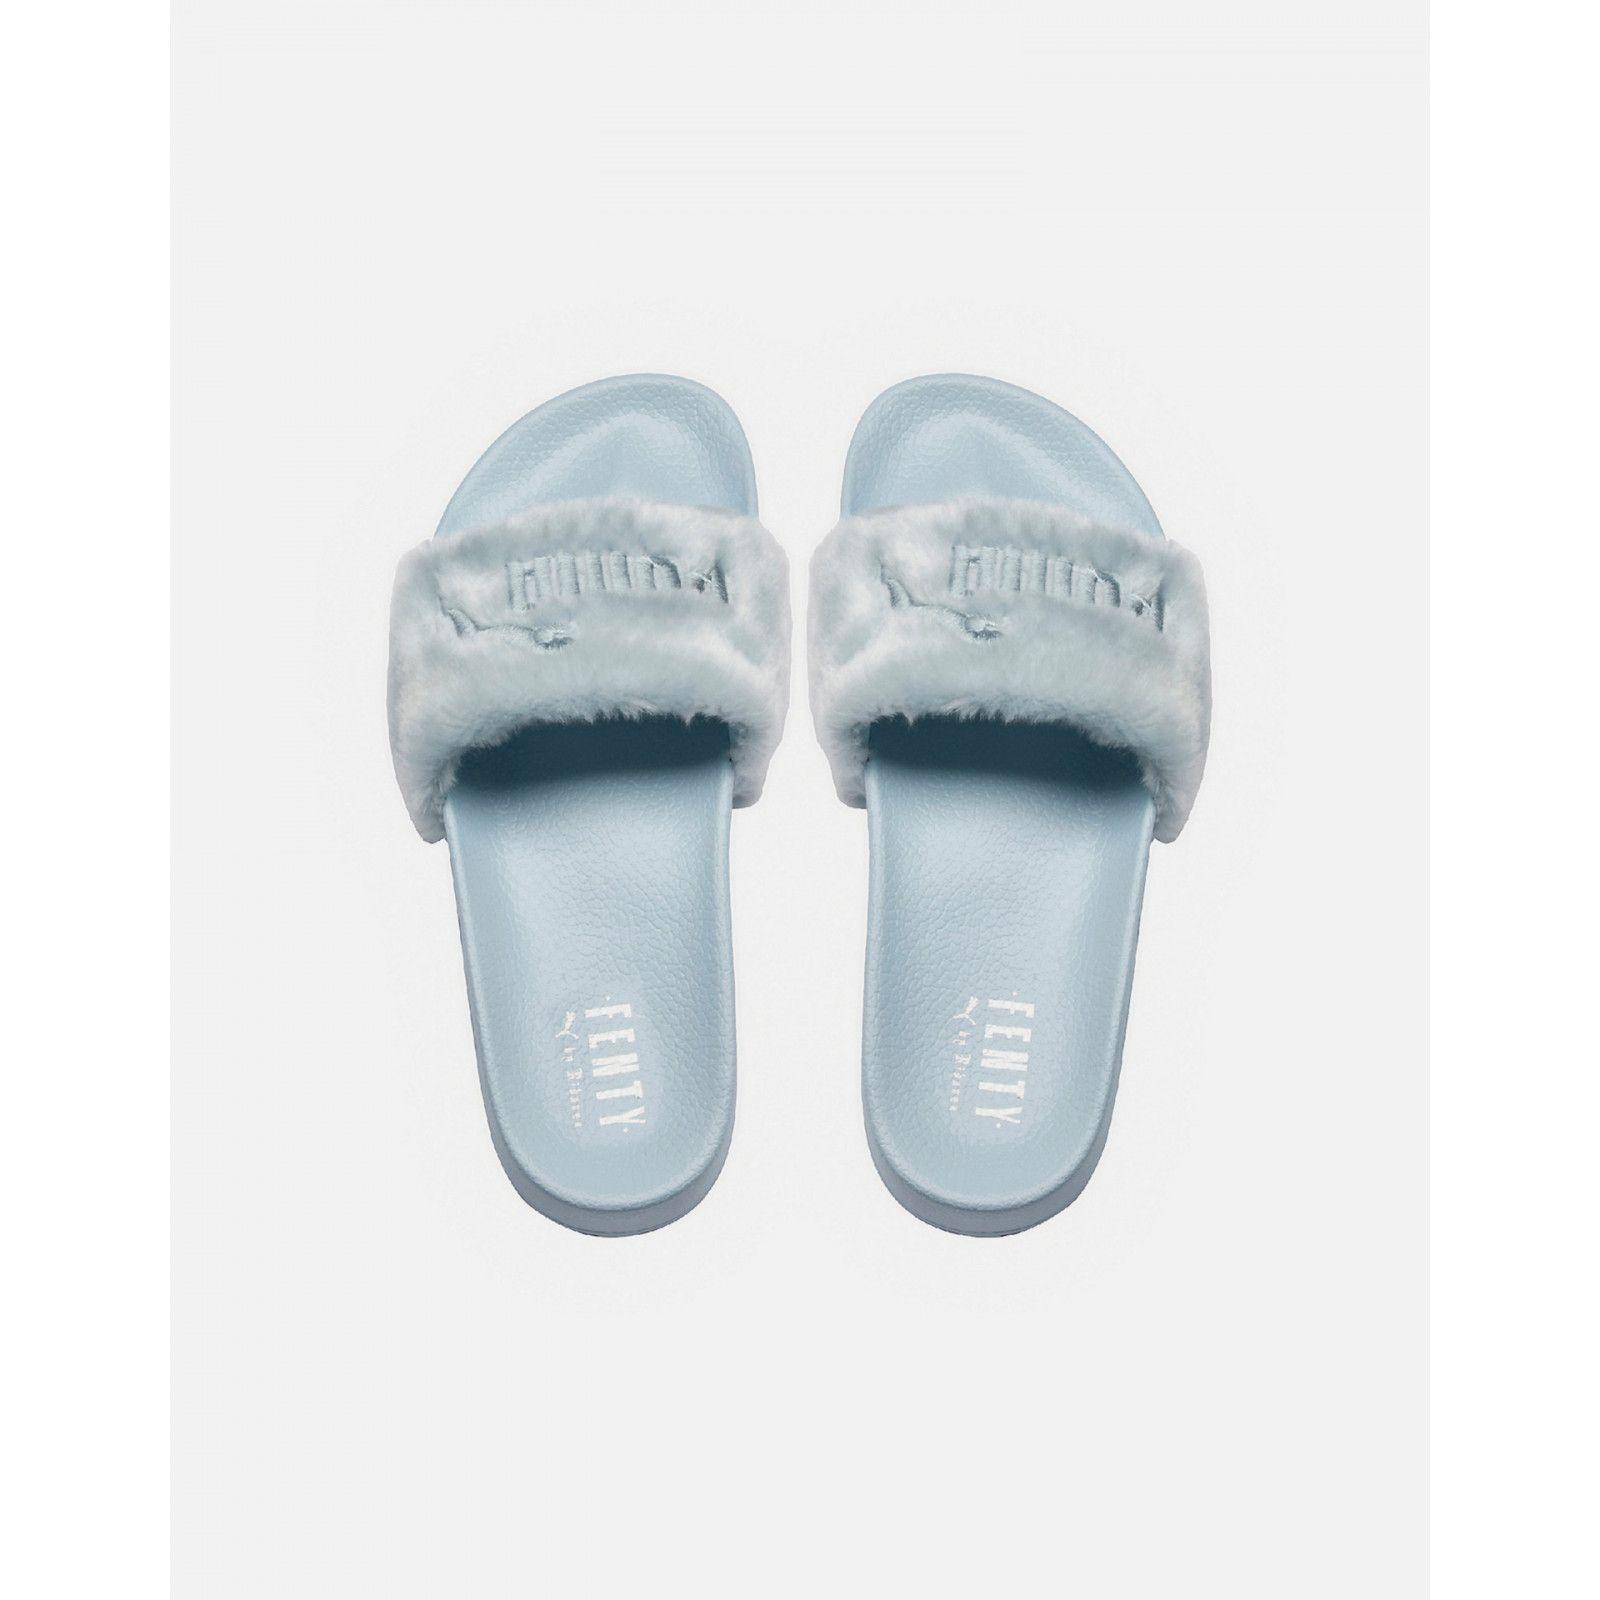 0535f10f86561d Puma Fenty Fur Slides (Cool Blue). Find this Pin and ...